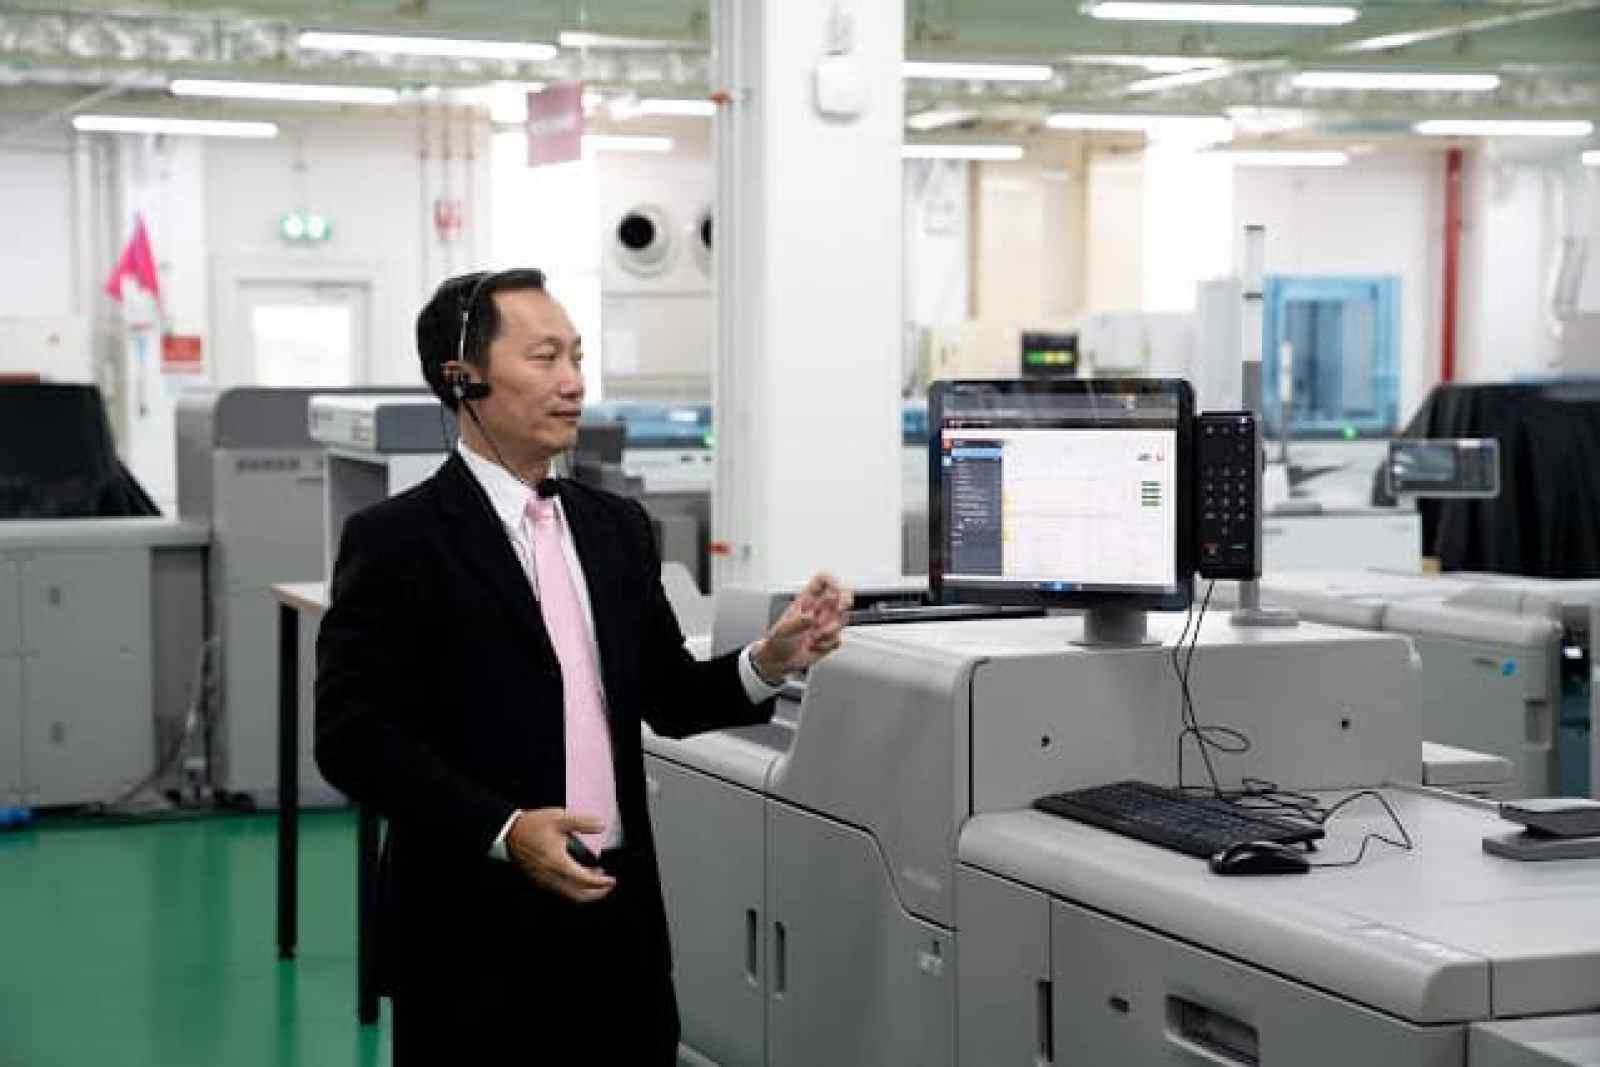 - DSC07819 2 - RICOH เปิดตัวผลิตภัณฑ์ใหม่ RICOH Pro T7210 และ RICOH Pro C7200x /C7210x ที่ RICOH Asia Pacific Customer Experience Center หรือ CEC